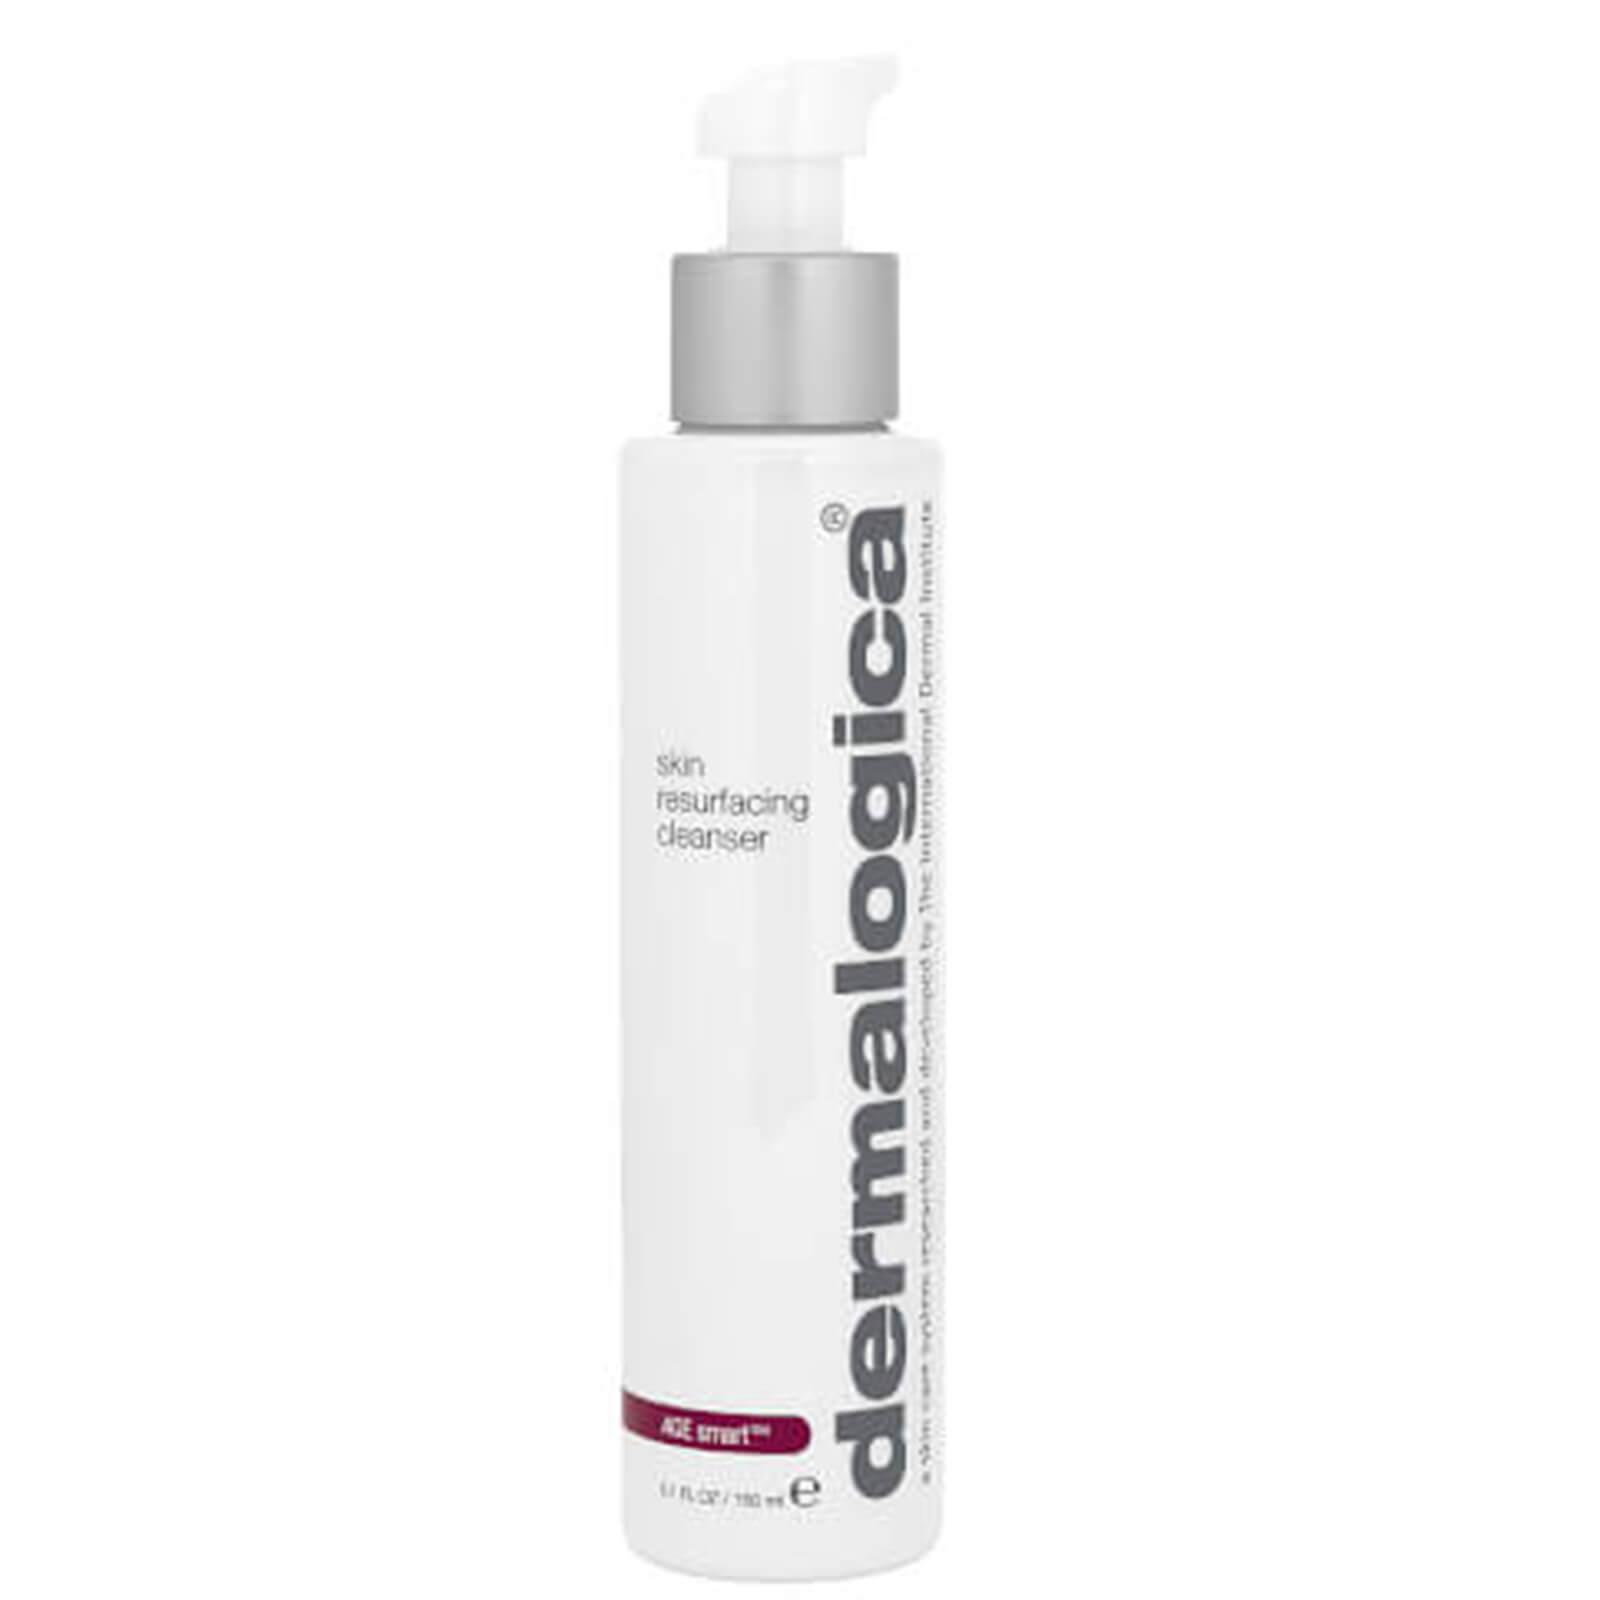 dermalogica cleanser for dry skin